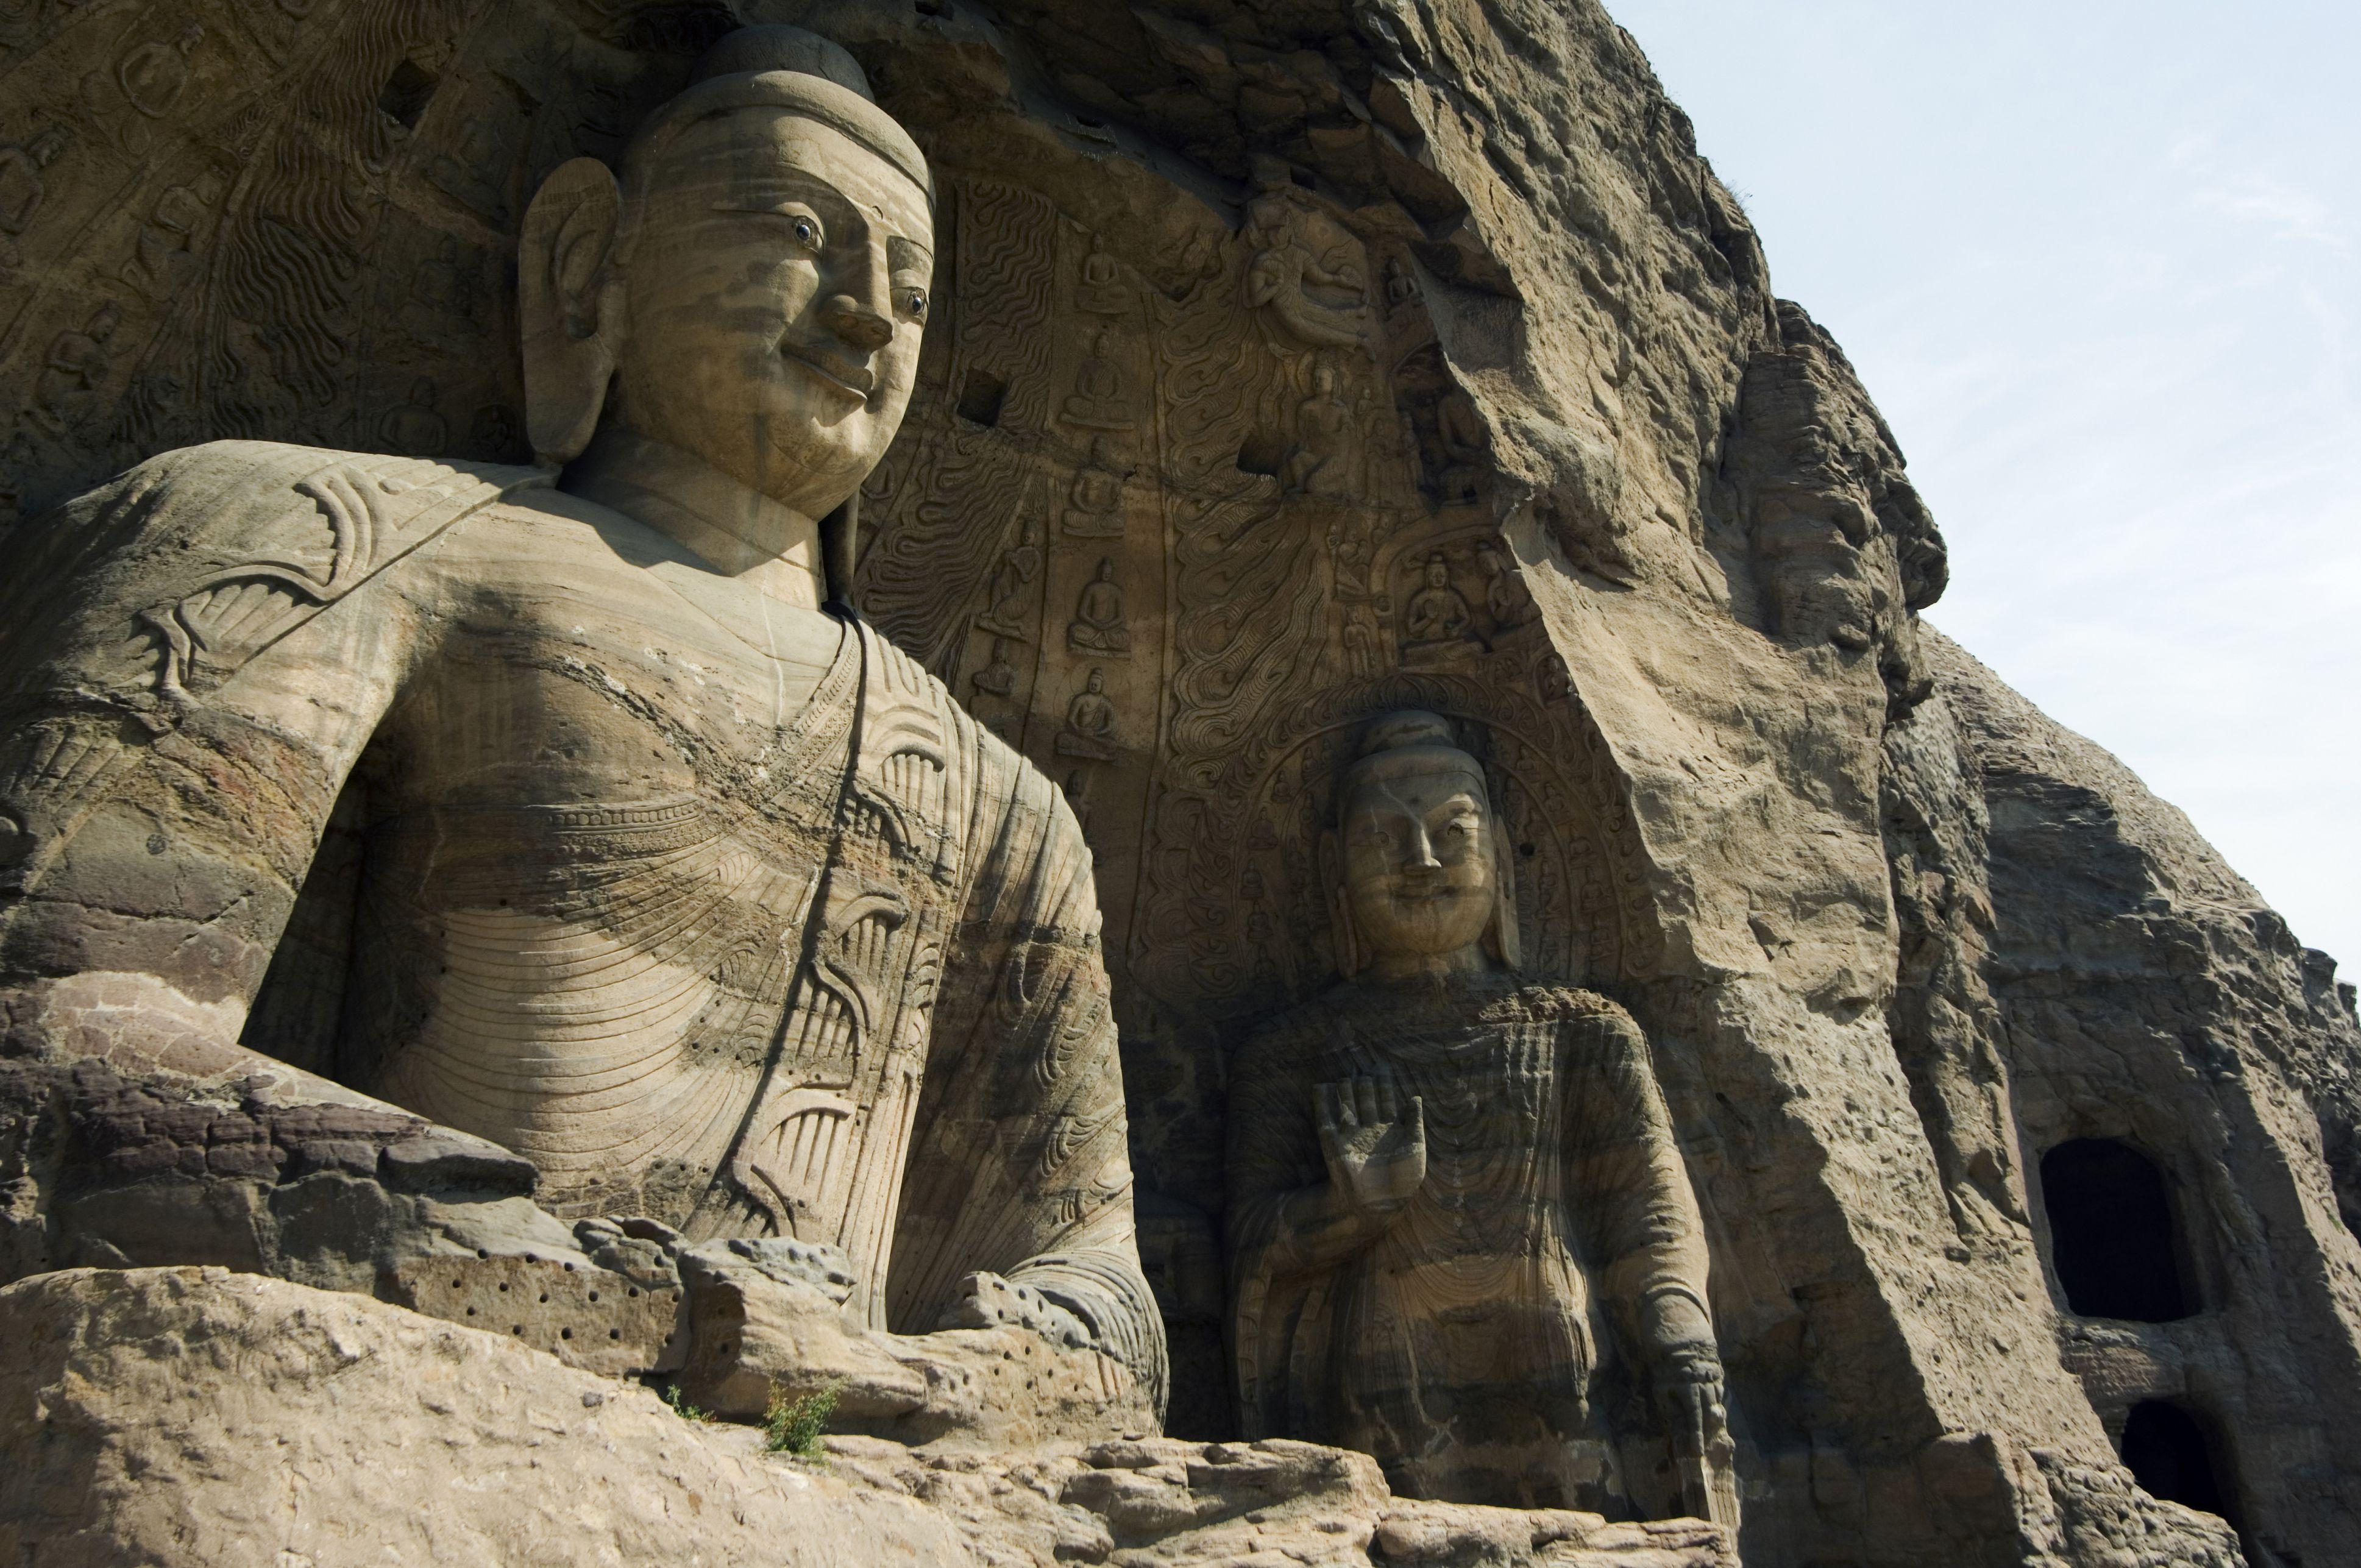 dbq 1 spread of buddhism in